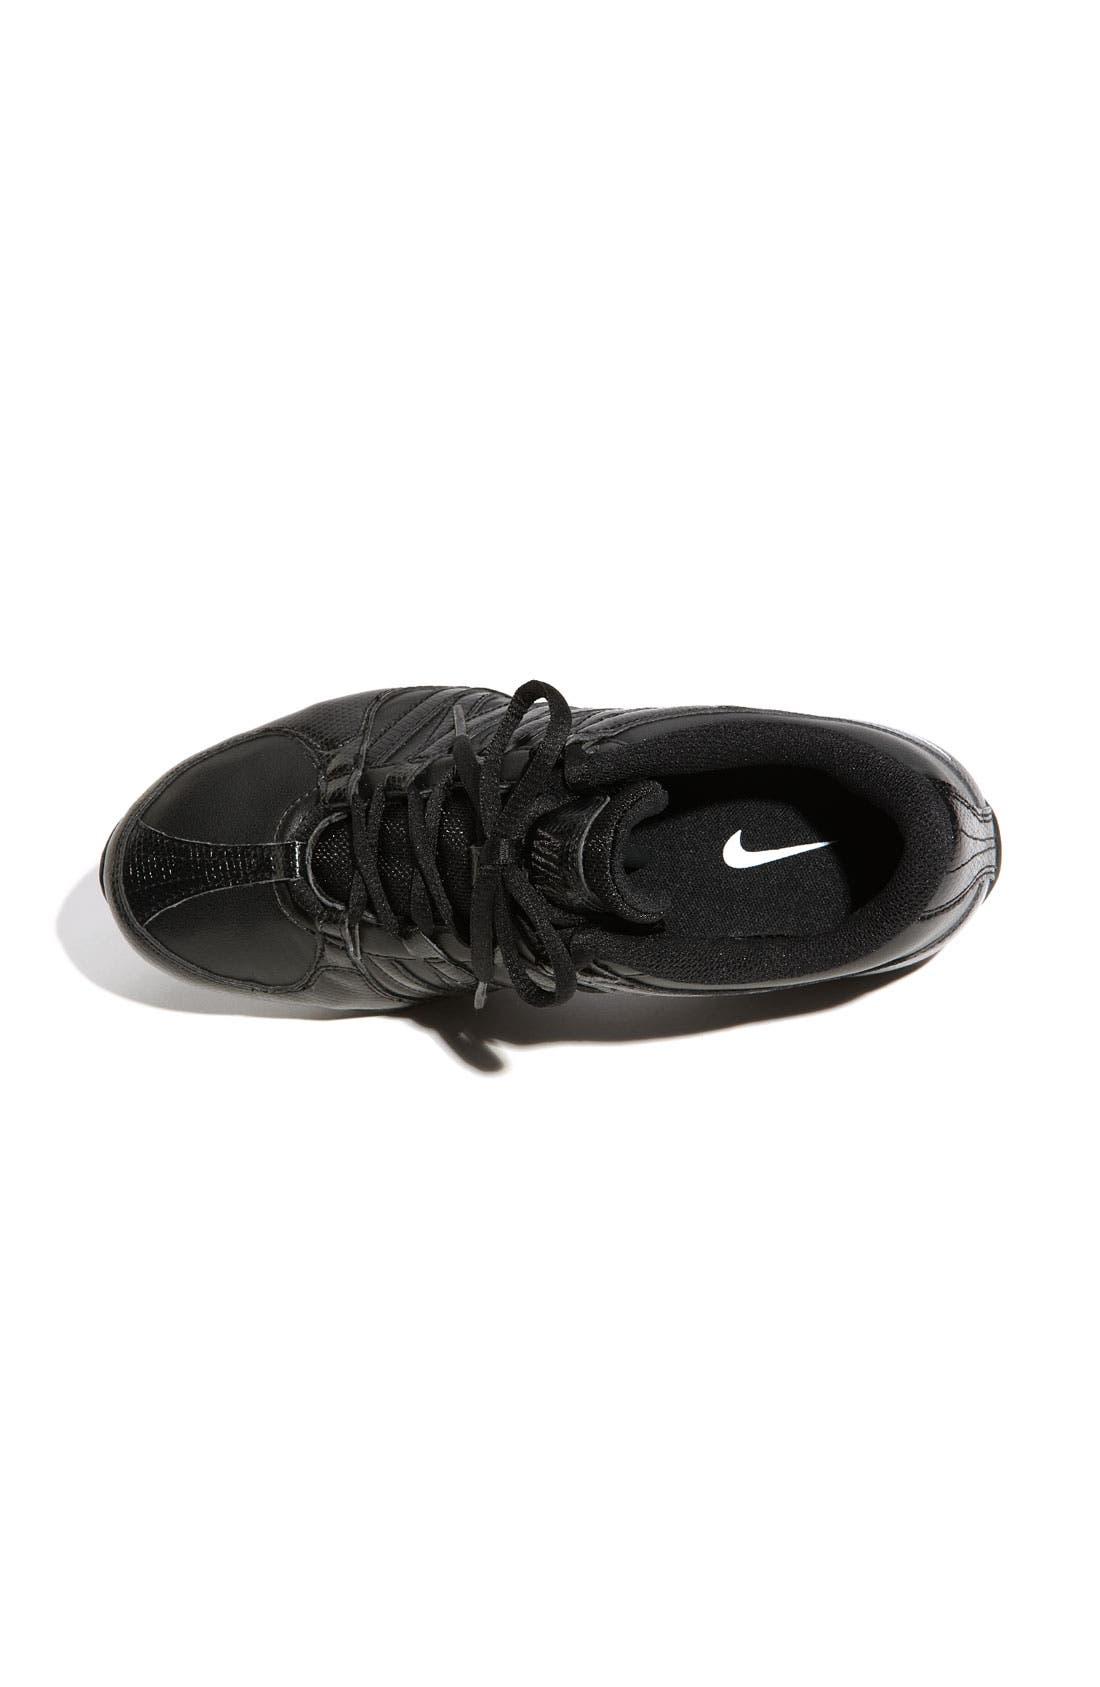 Alternate Image 3  - Nike 'Musique IV' Dance Shoe